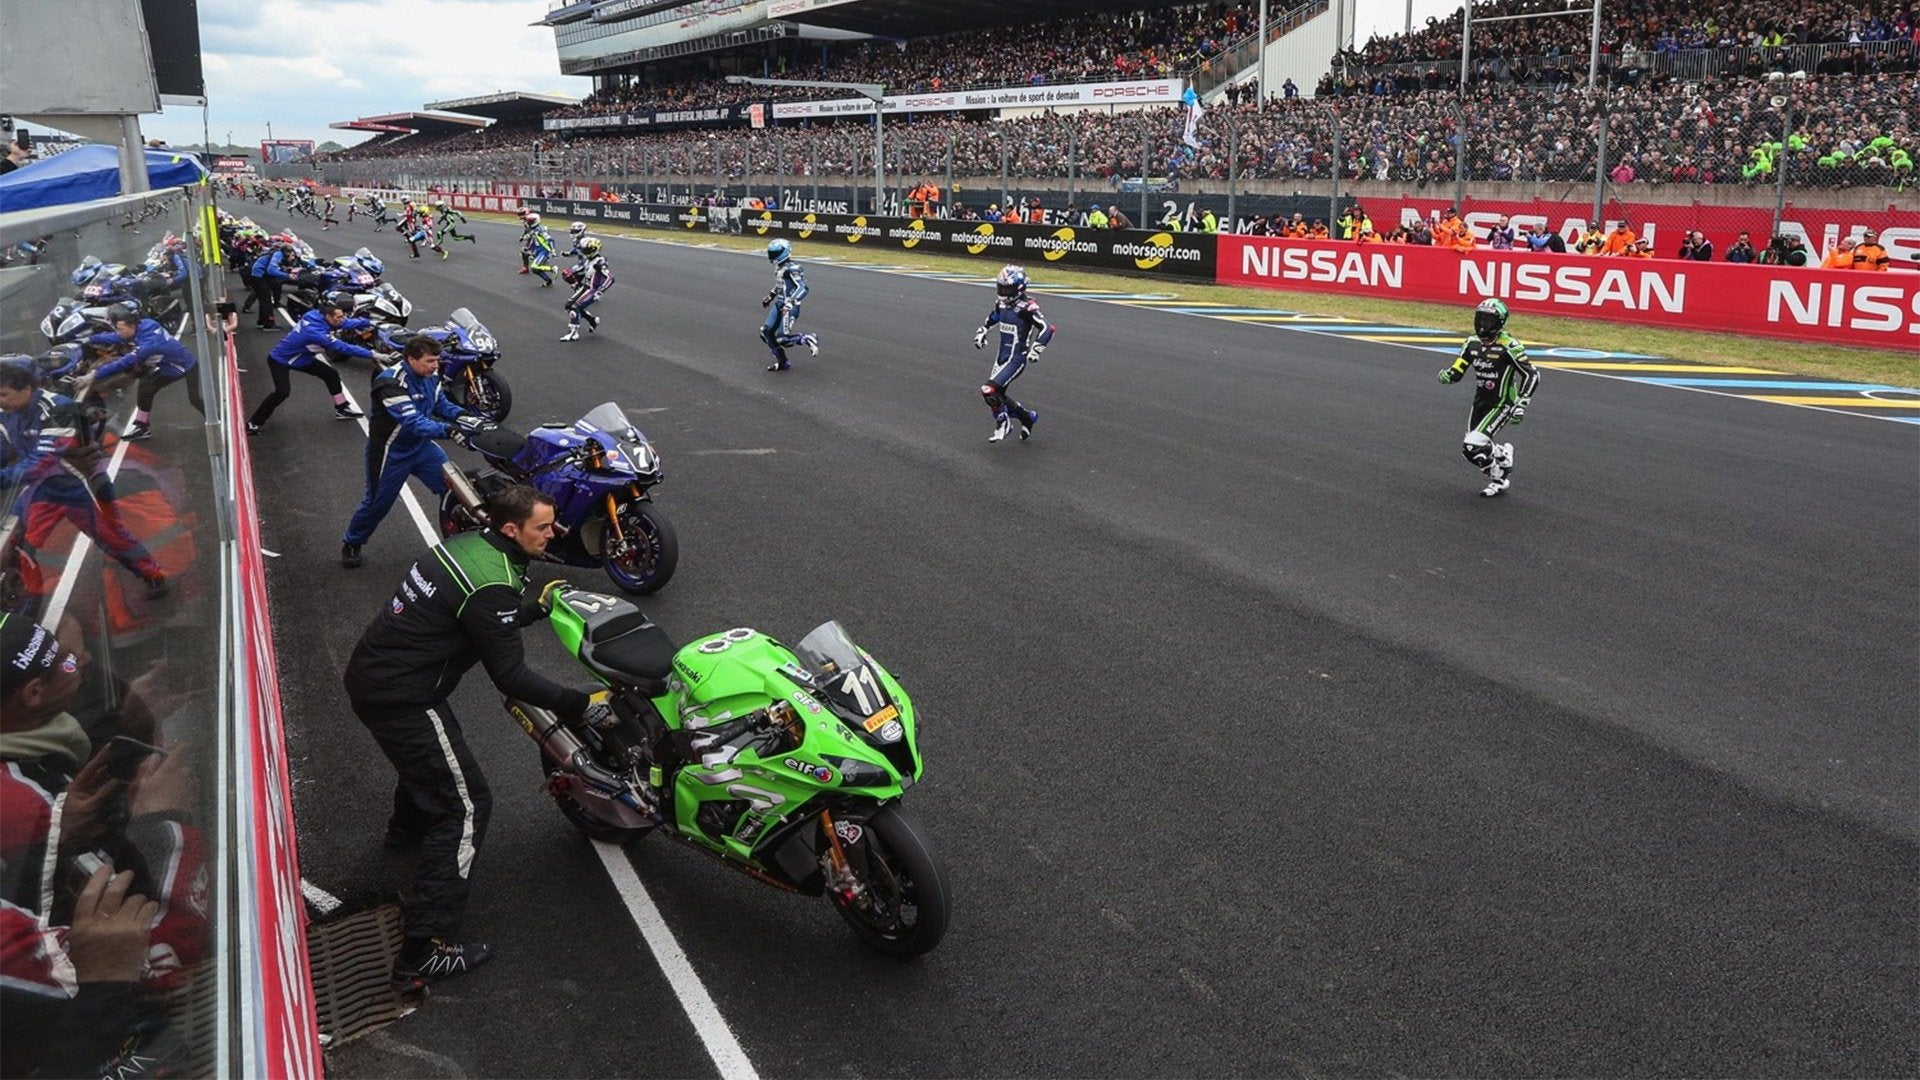 2017 FIM Endurance World Championship: France / 24H Du Mans Behind the Scenes